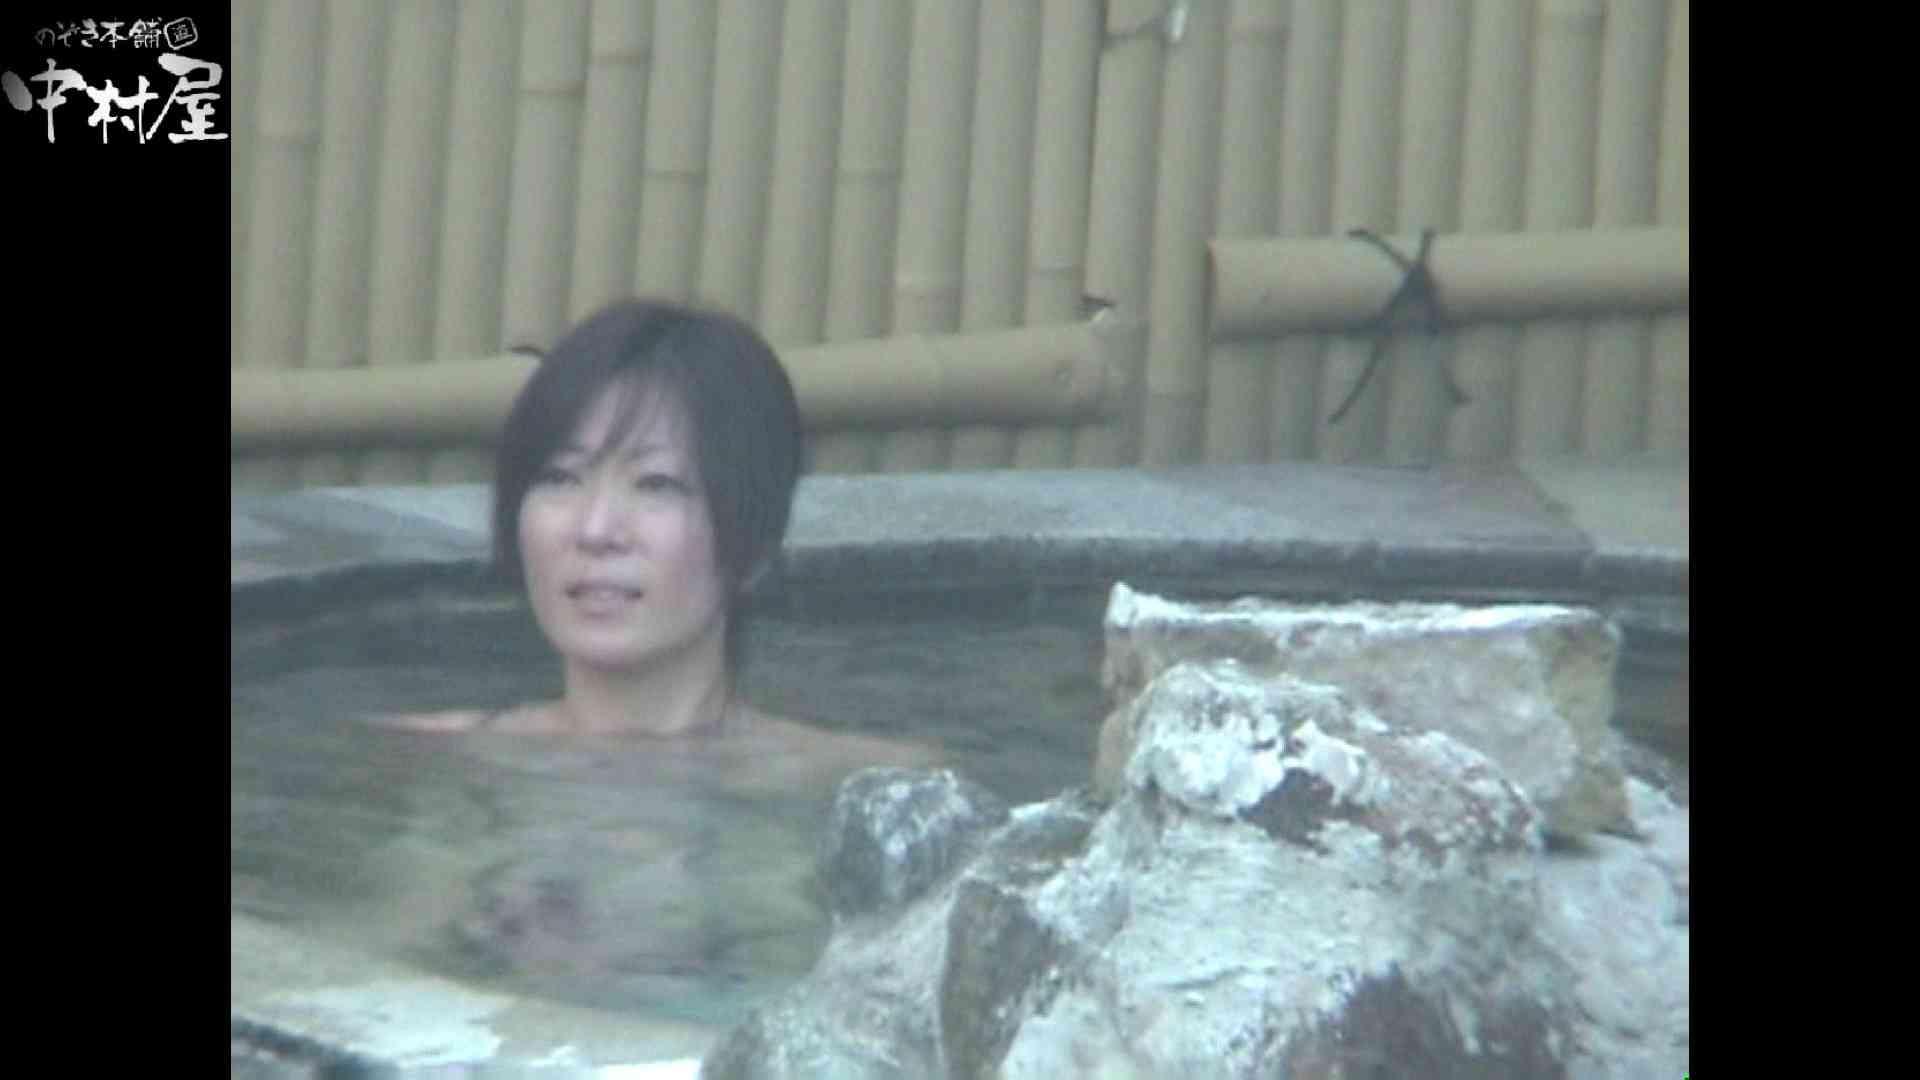 Aquaな露天風呂Vol.972 露天   OLセックス  80画像 25